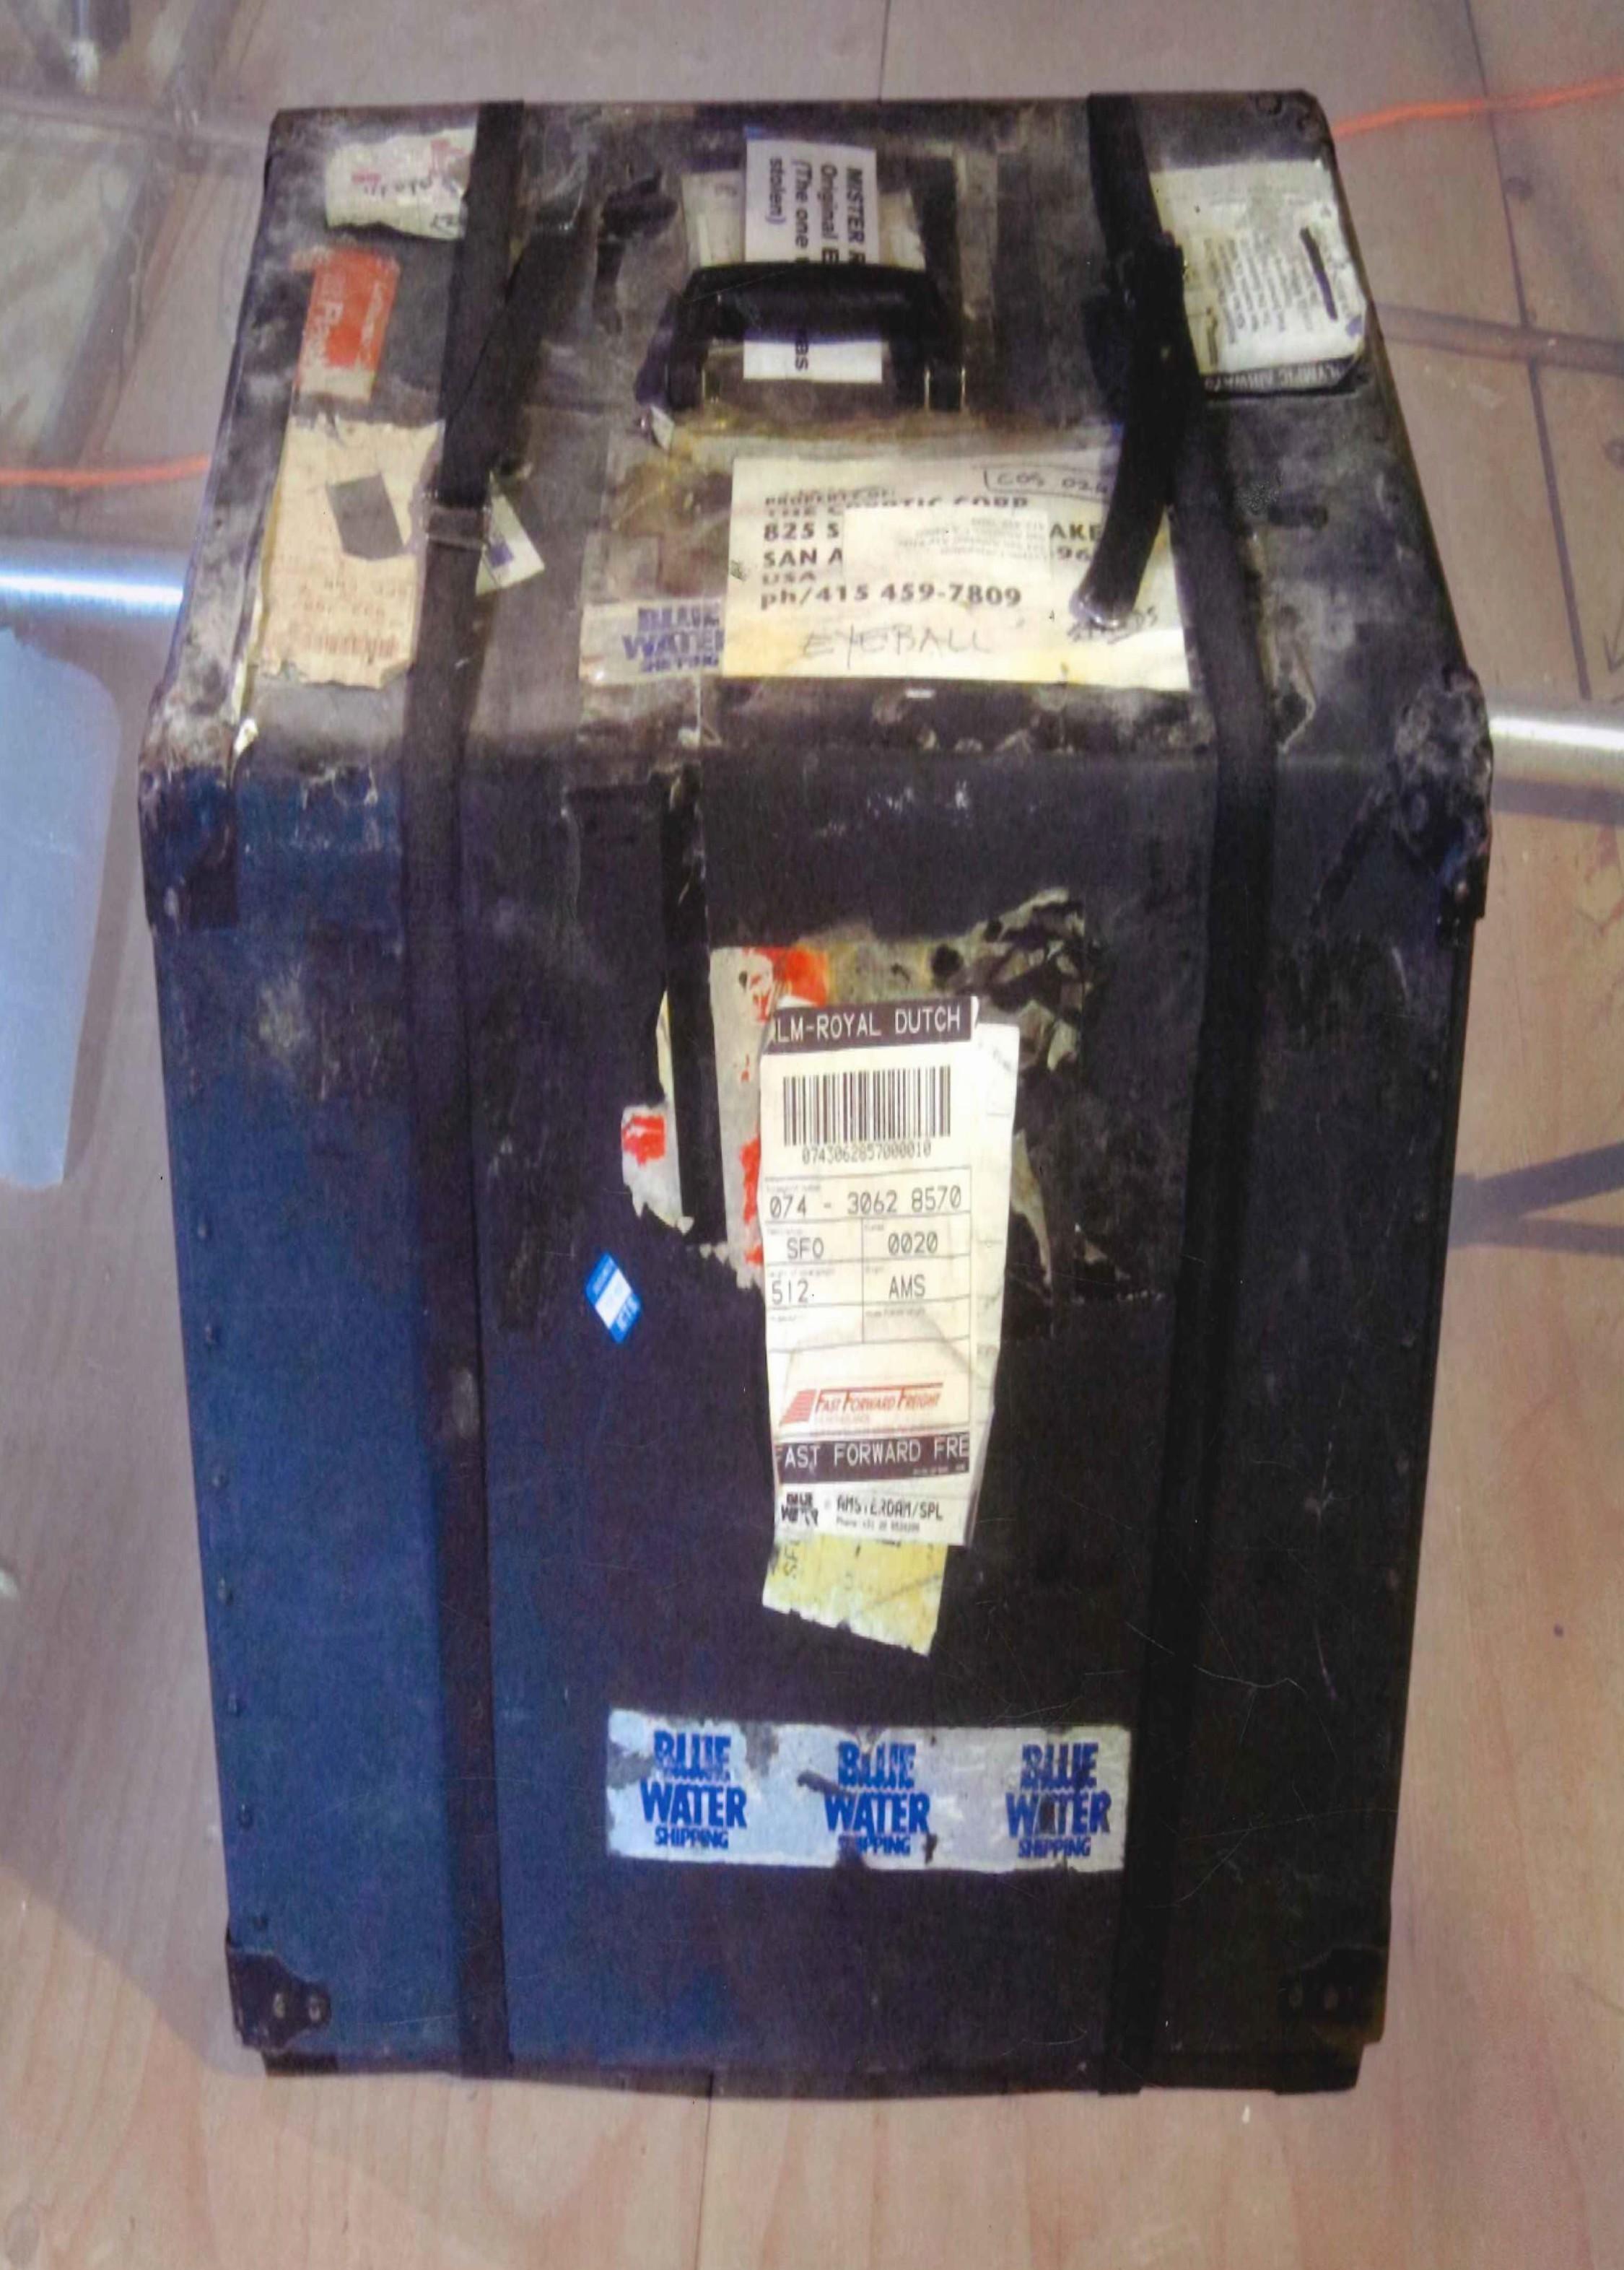 intercepted package